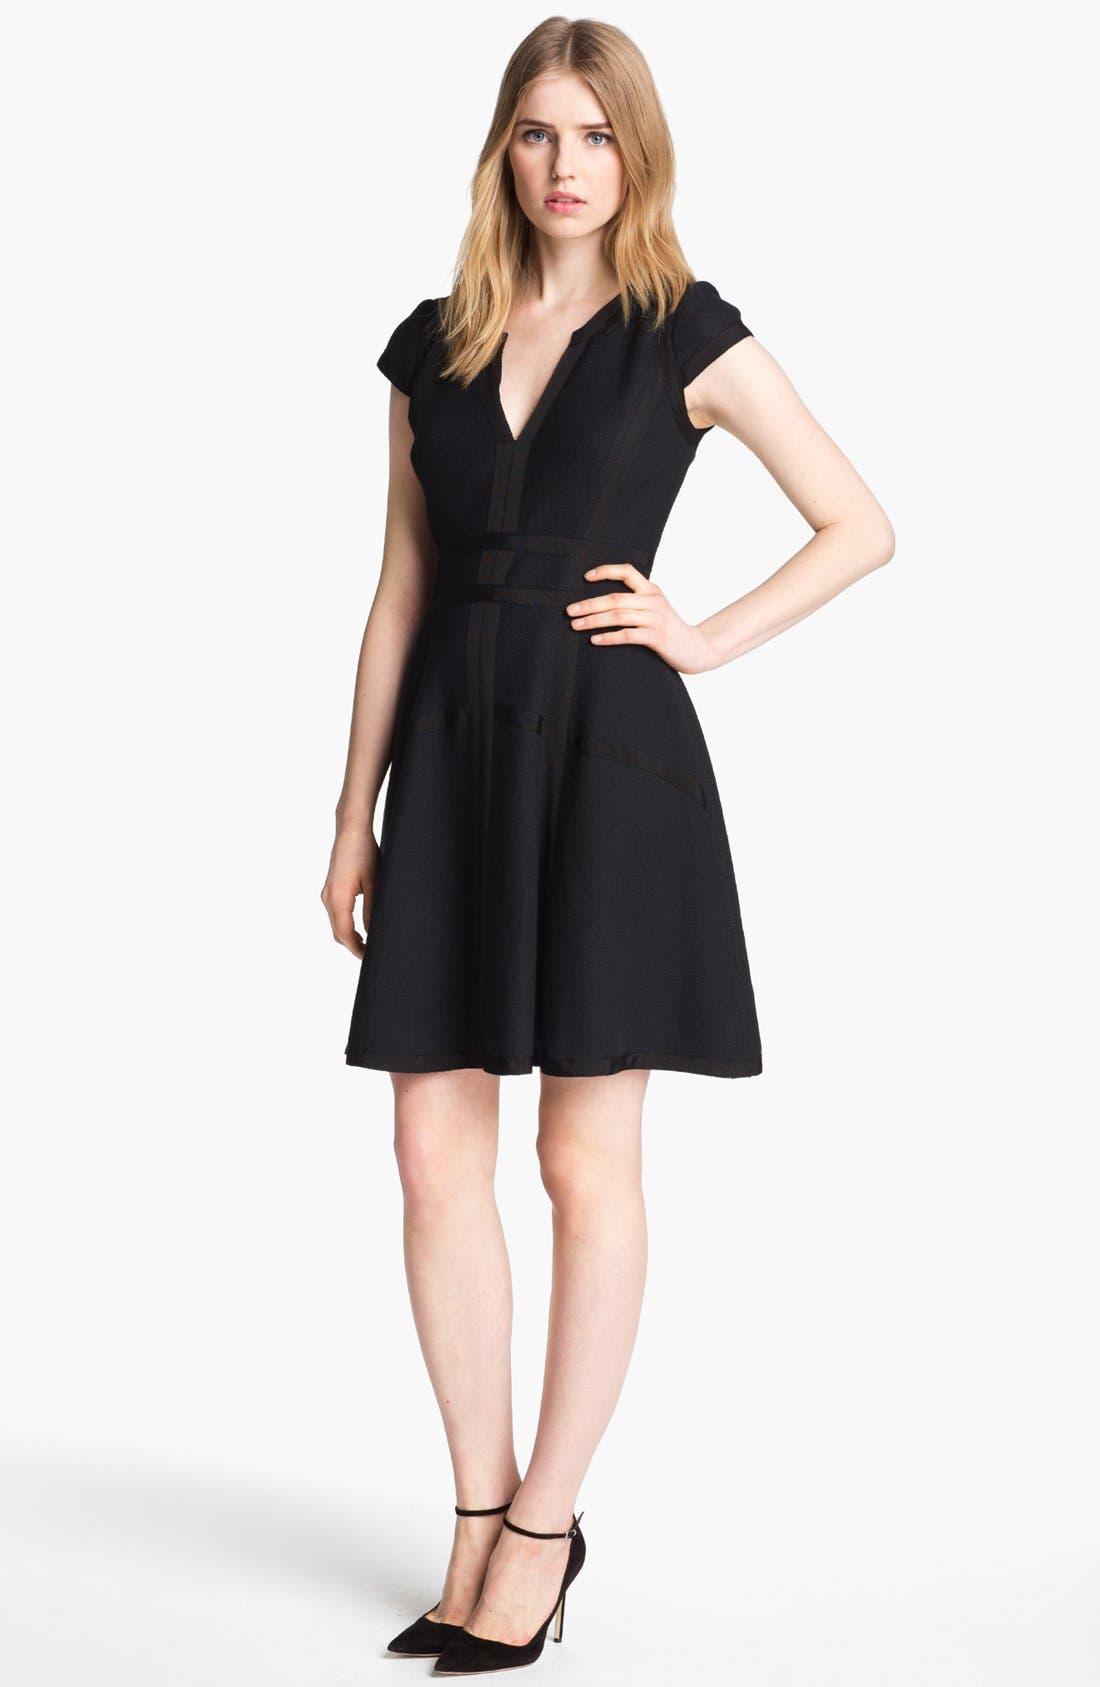 Alternate Image 1 Selected - Mcginn 'Anna' Textured Dress